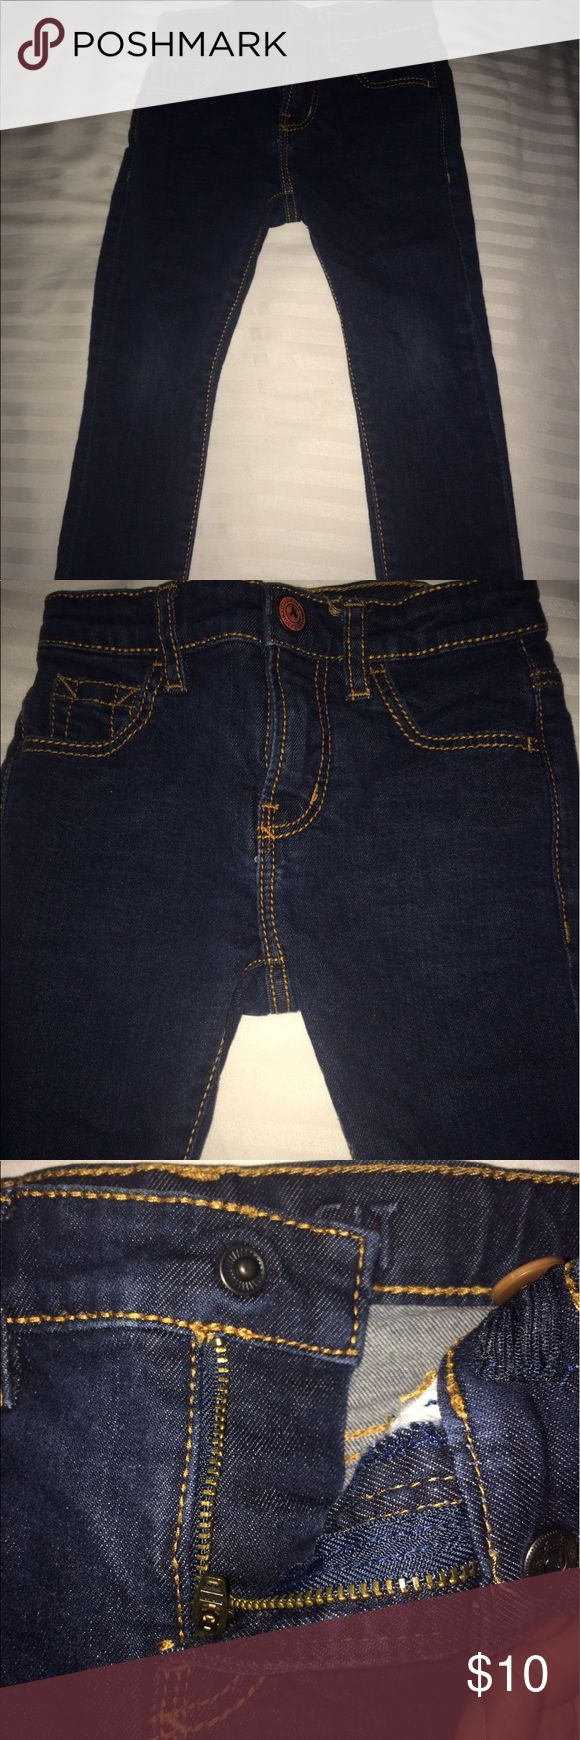 Zara Kids Dark Blue Denim Jeans Great Condition dark blue denim jeans from Zara. It has orange stitching on back pockets. It also has hidden snap fly and adjustable inner elastic waist. Slight discoloration on the knees Zara Bottoms Jeans